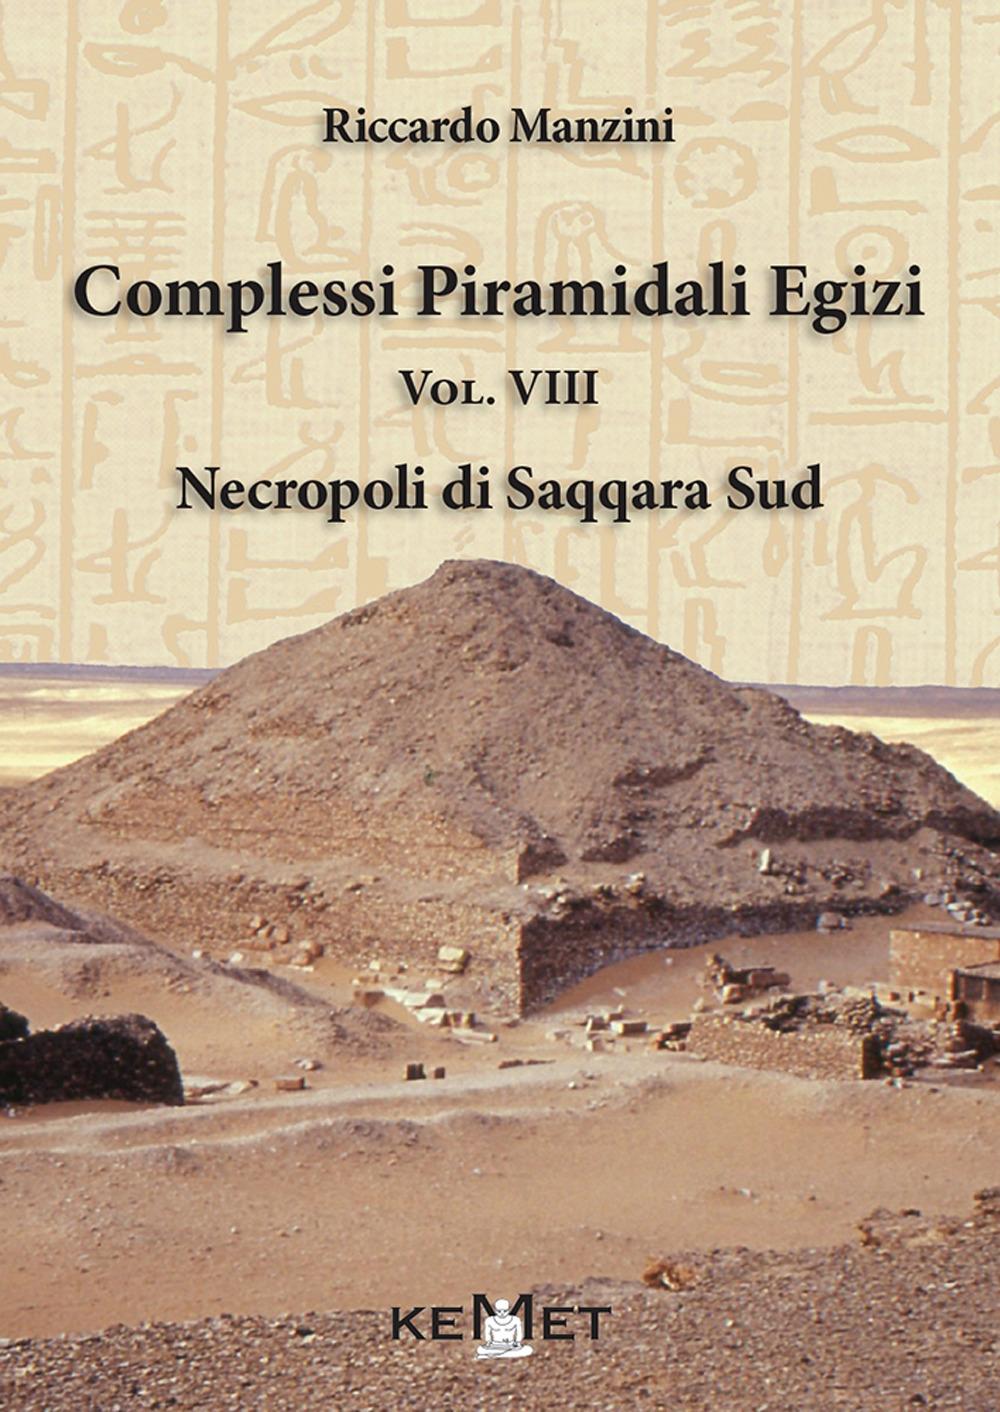 Complessi Piramidali Egizi. Vol. VIII. Necropoli di Saqqara Sud